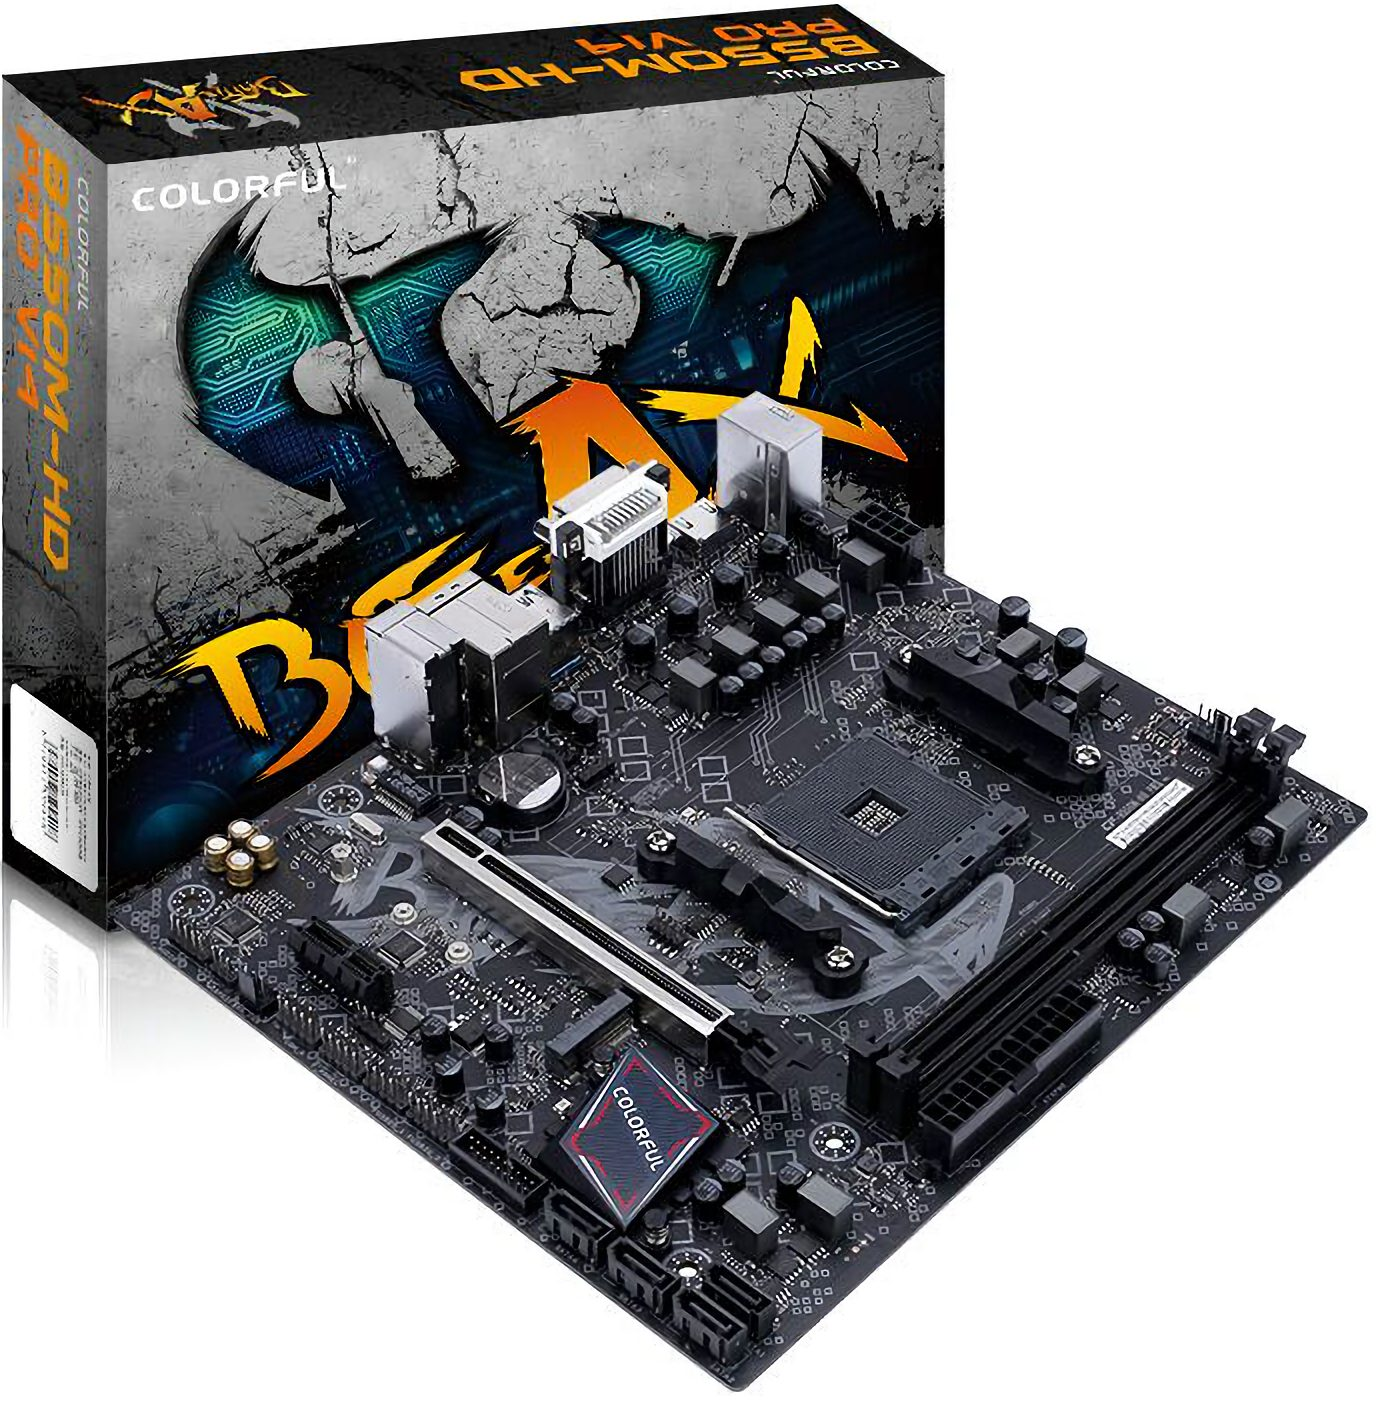 Colorful B550M-HD PRO BATTLE-AX V14 - DDR4 AMD RYZEN AM4 Socket Motherboard - COLORFUL 2.35.66.00.004